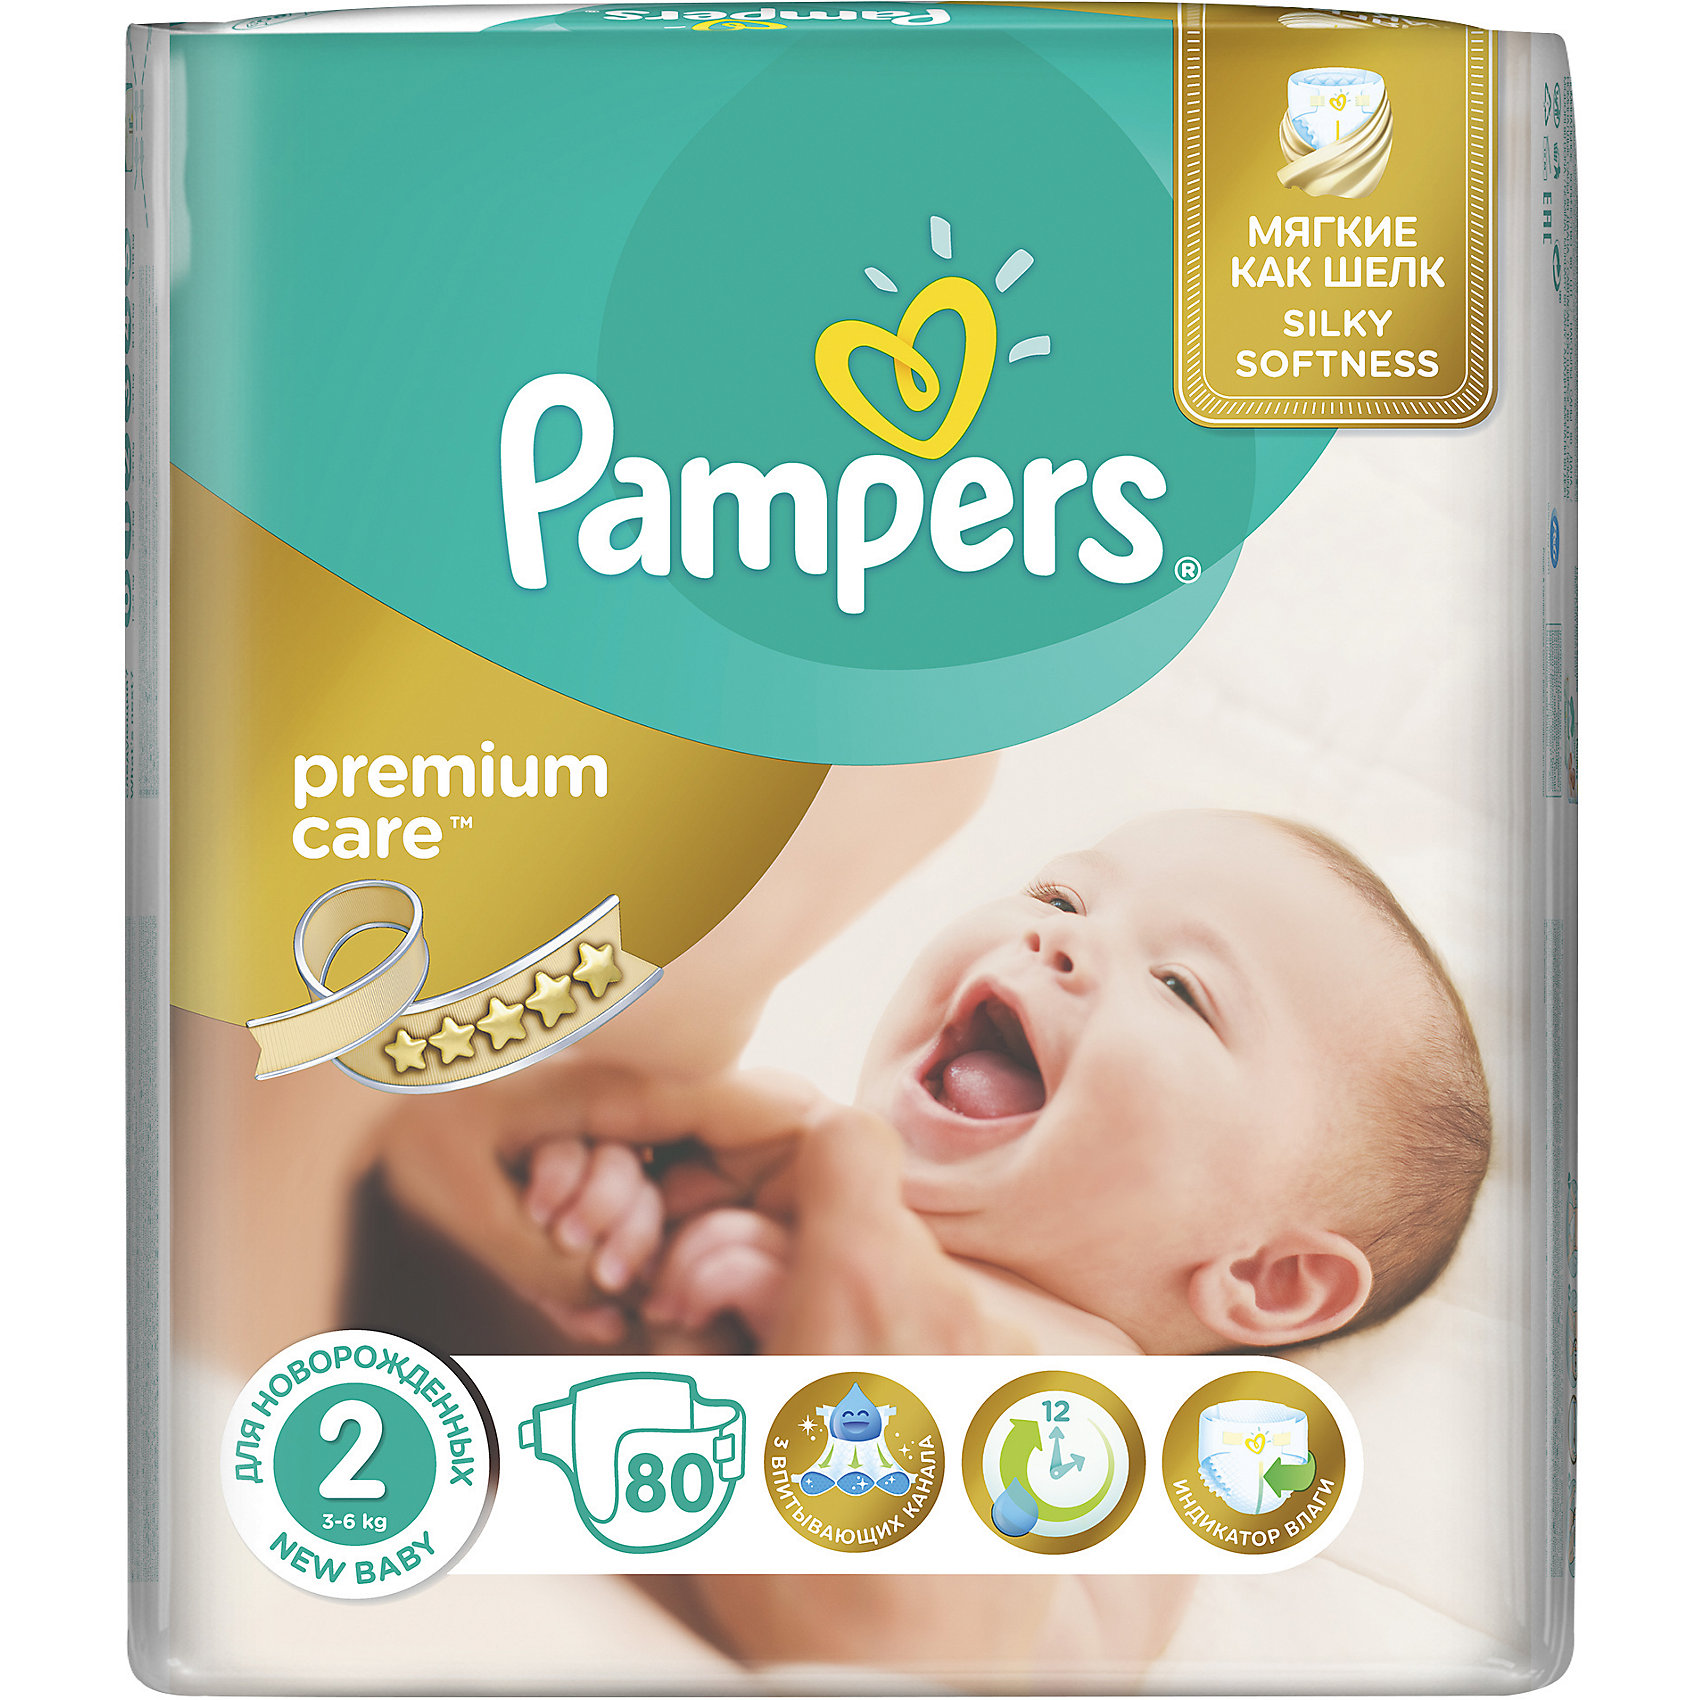 Подгузники Pampers Premium Care MIni, 3-6 кг, 2 размер, Economy pack, 80 шт., PampersПодгузники классические<br><br><br>Ширина мм: 316<br>Глубина мм: 110<br>Высота мм: 376<br>Вес г: 1762<br>Возраст от месяцев: 1<br>Возраст до месяцев: 3<br>Пол: Унисекс<br>Возраст: Детский<br>SKU: 5516311